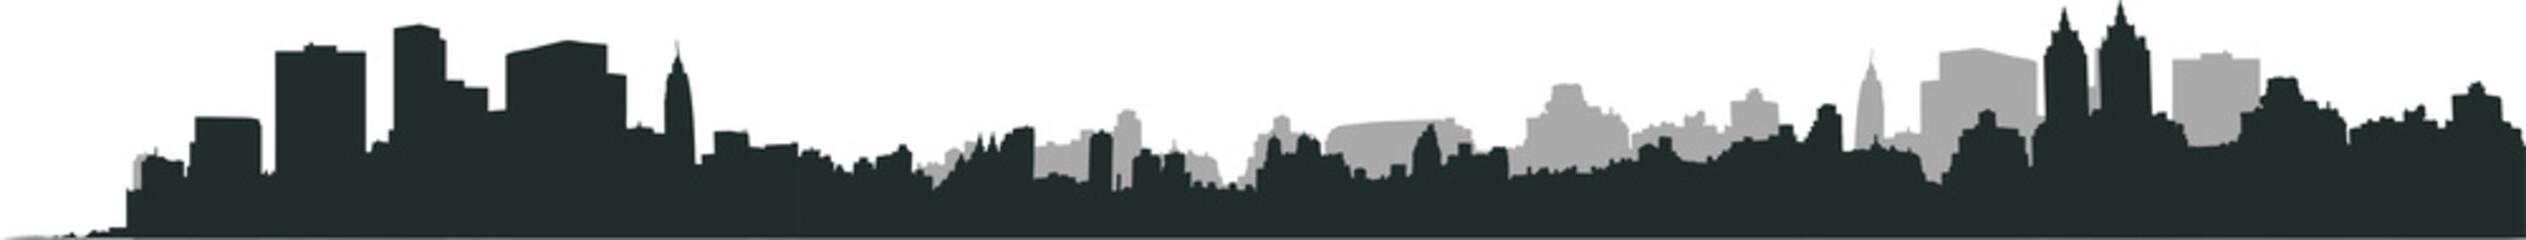 Photo sur Plexiglas Gris traffic ニューヨークの風景シルエット